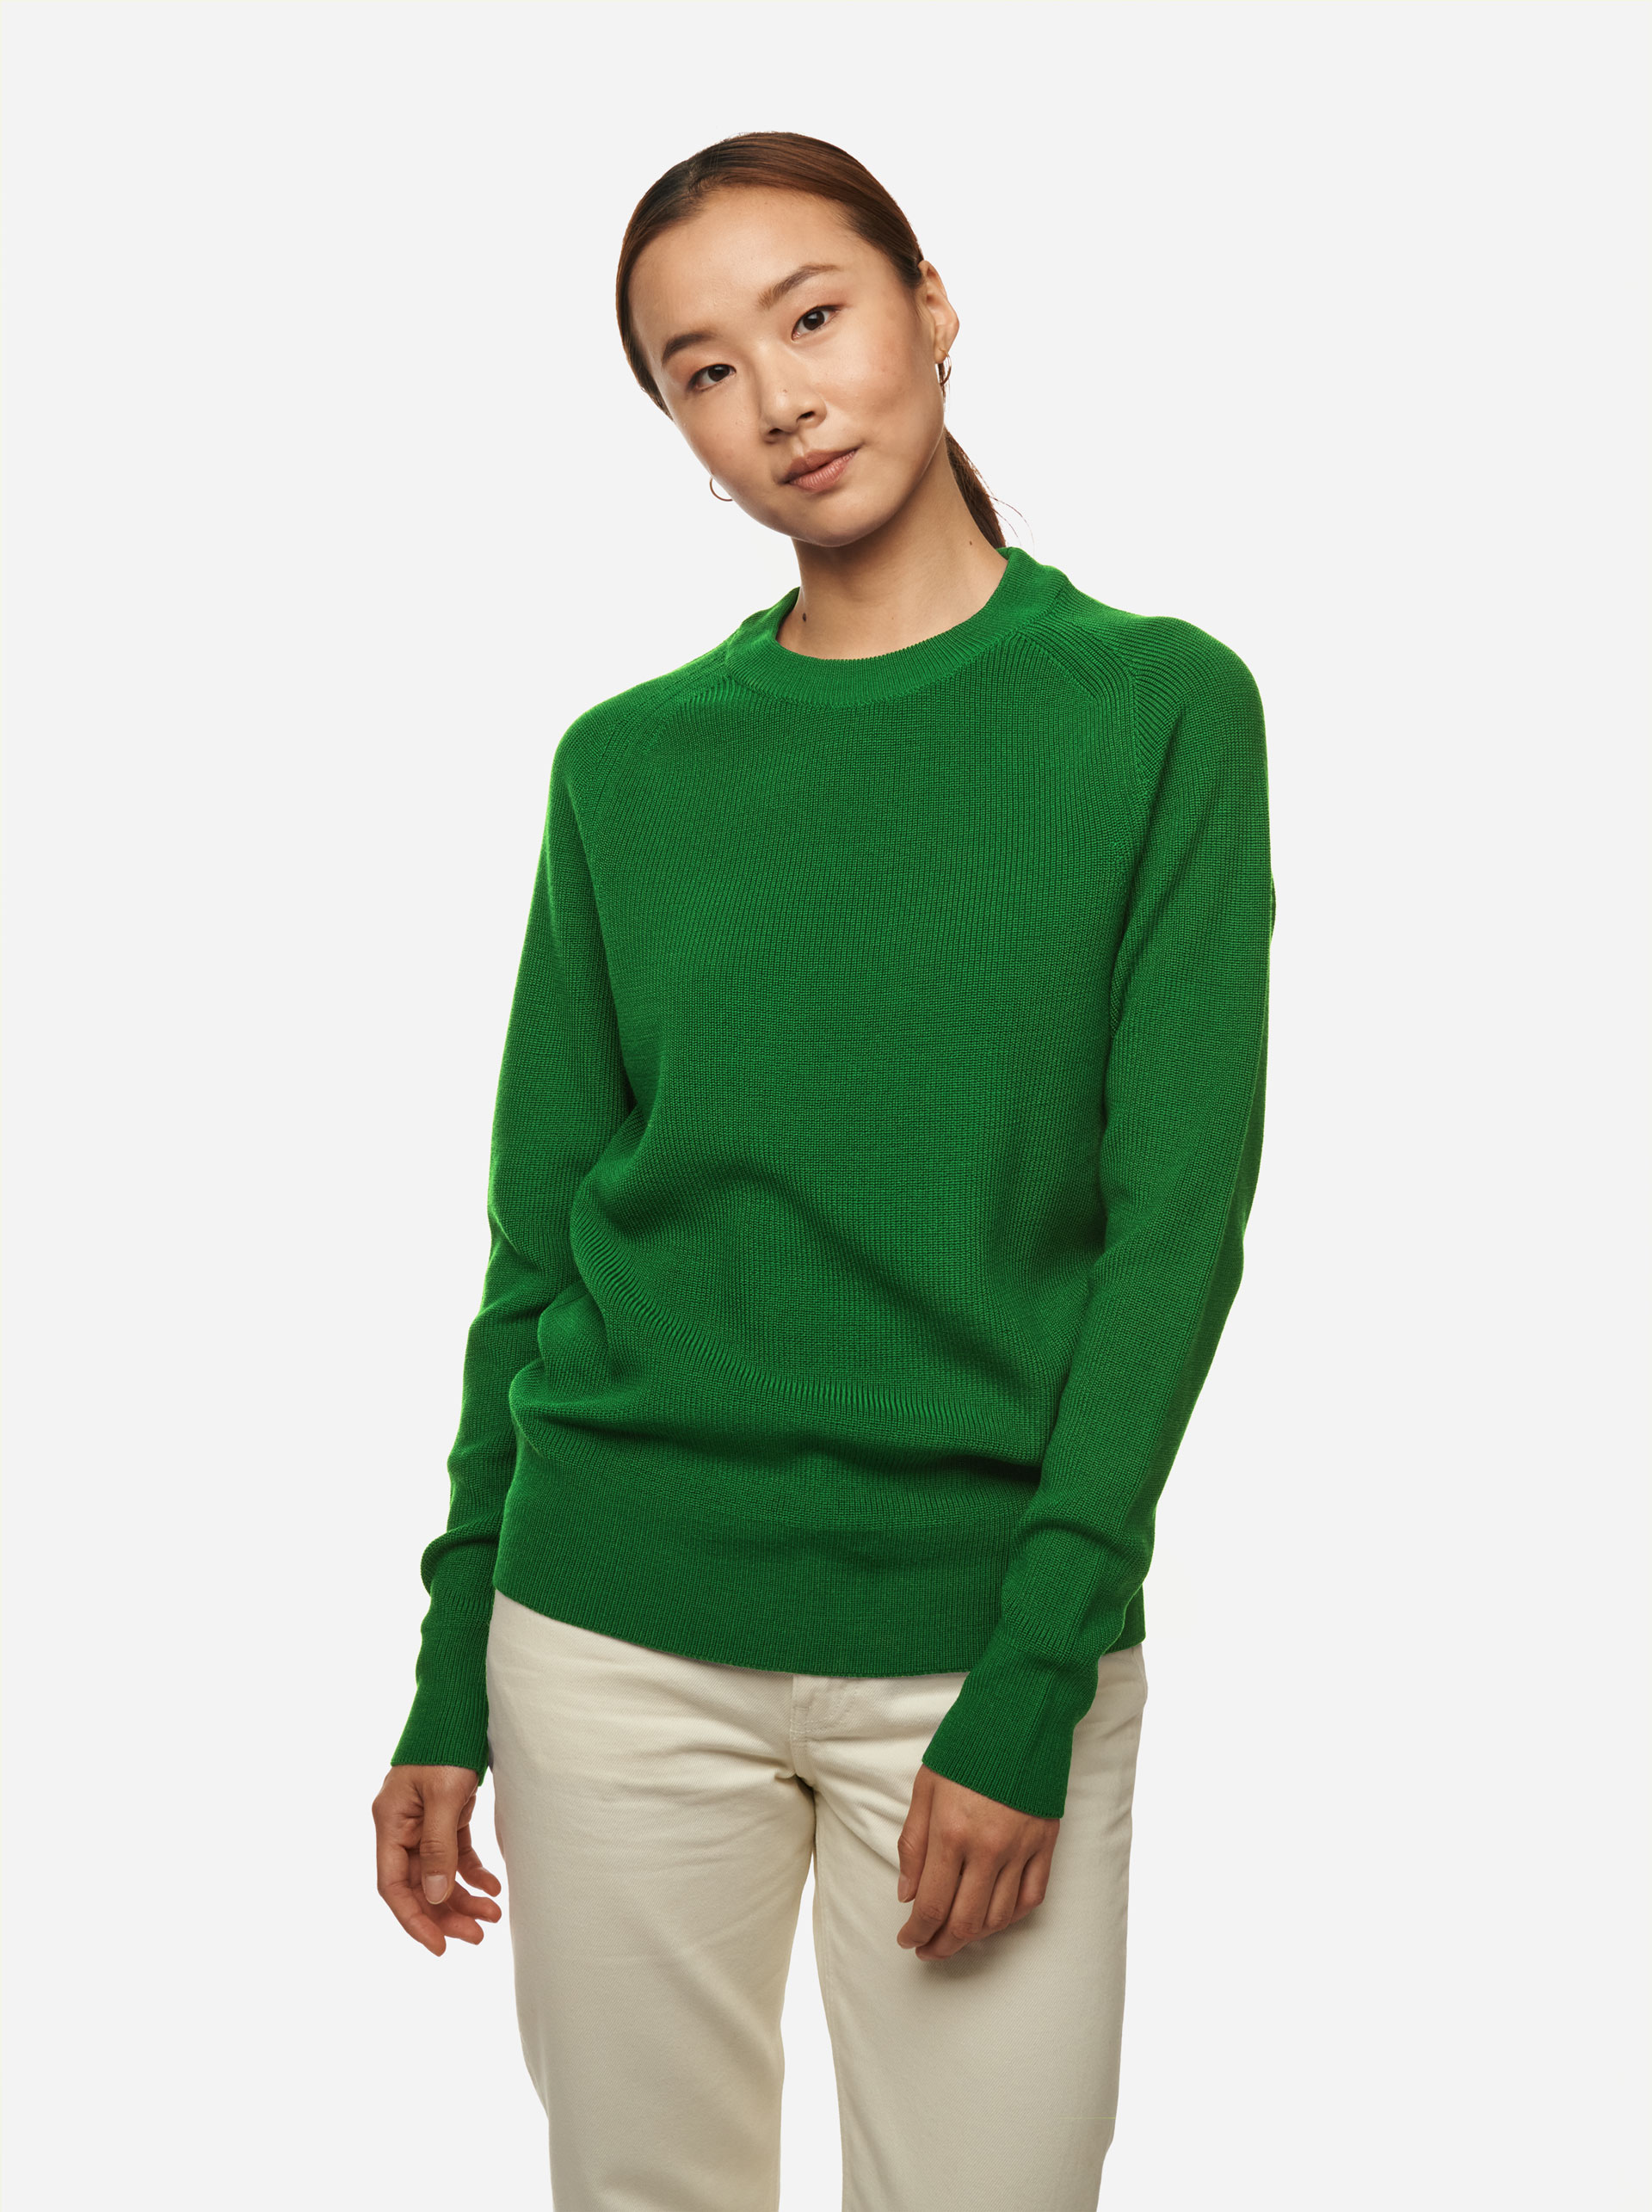 Teym - Crewneck - The Merino Sweater - Women - Brigh Green - 2